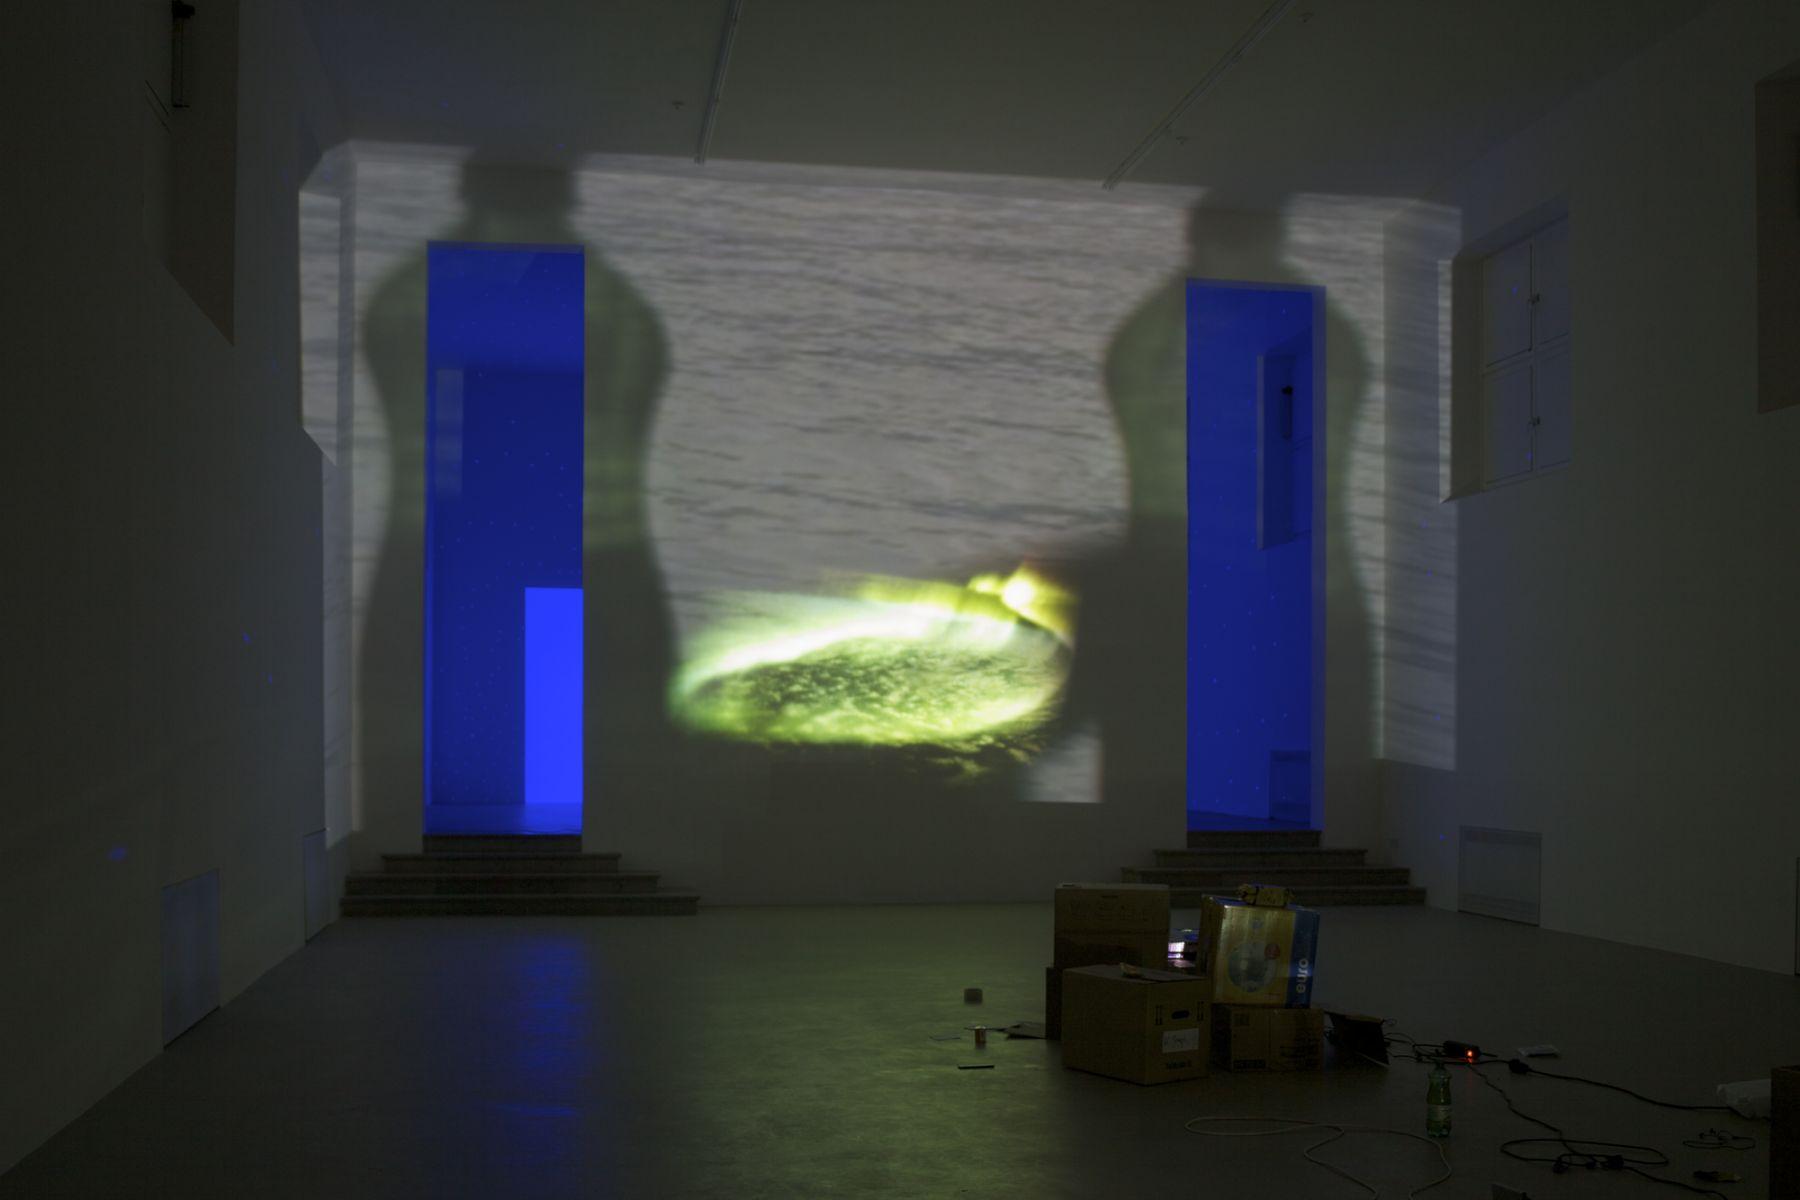 Trisha Baga, drowned world / substitute for love, 2012